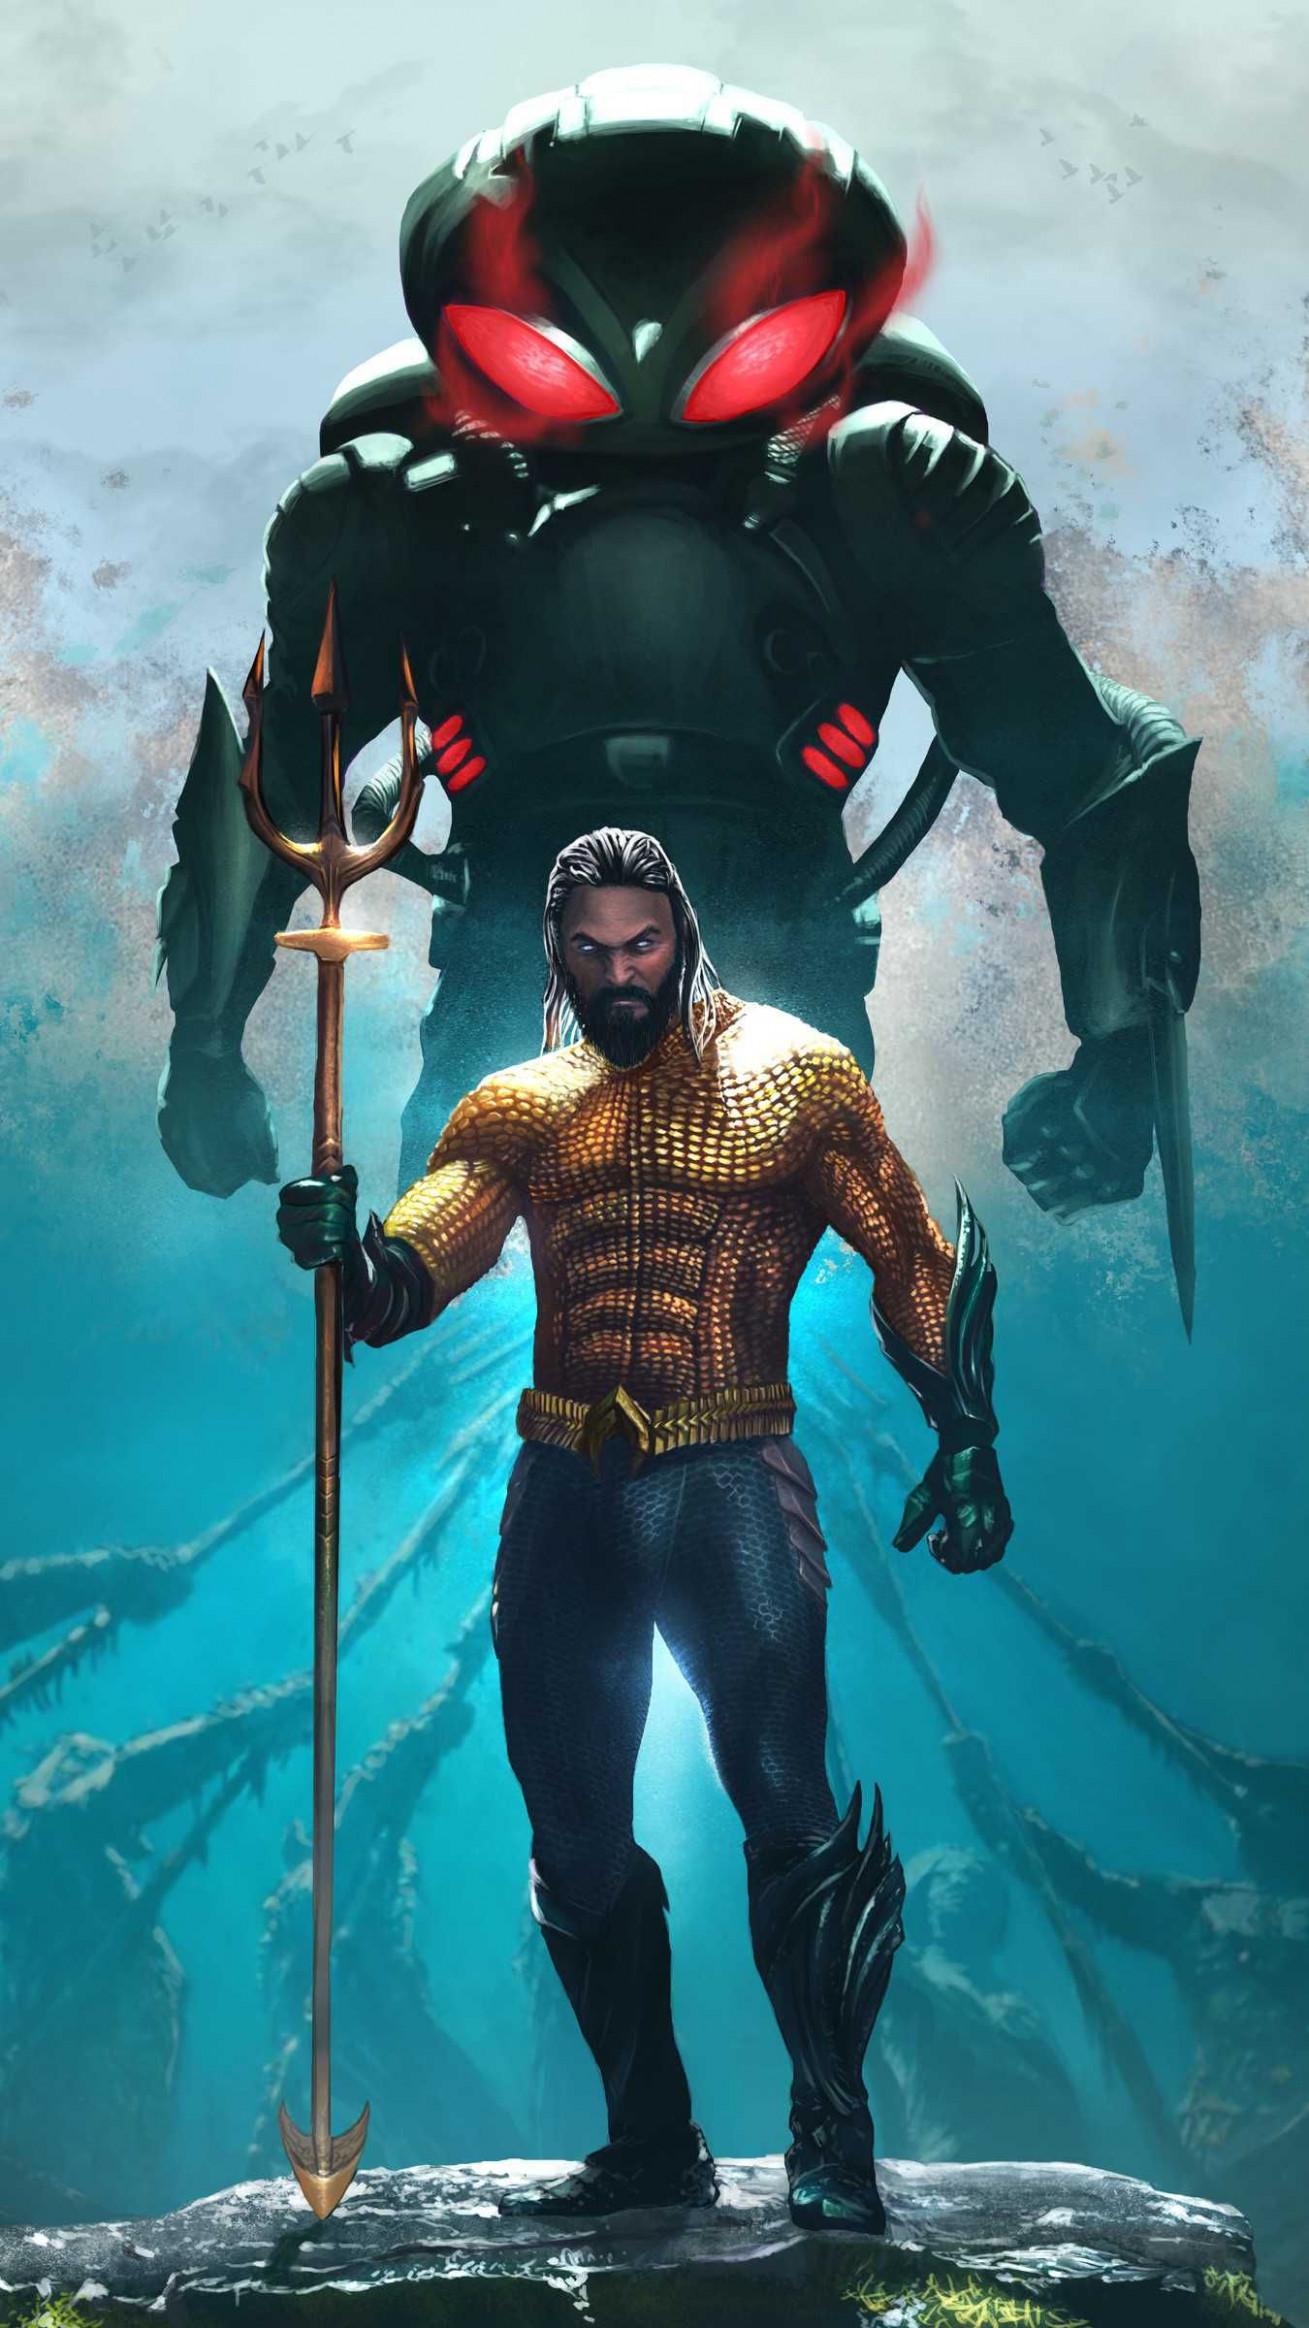 Aquaman And Black Manta Iphone Wallpaper - Ultra Hd Superhero Wallpaper 4k - HD Wallpaper